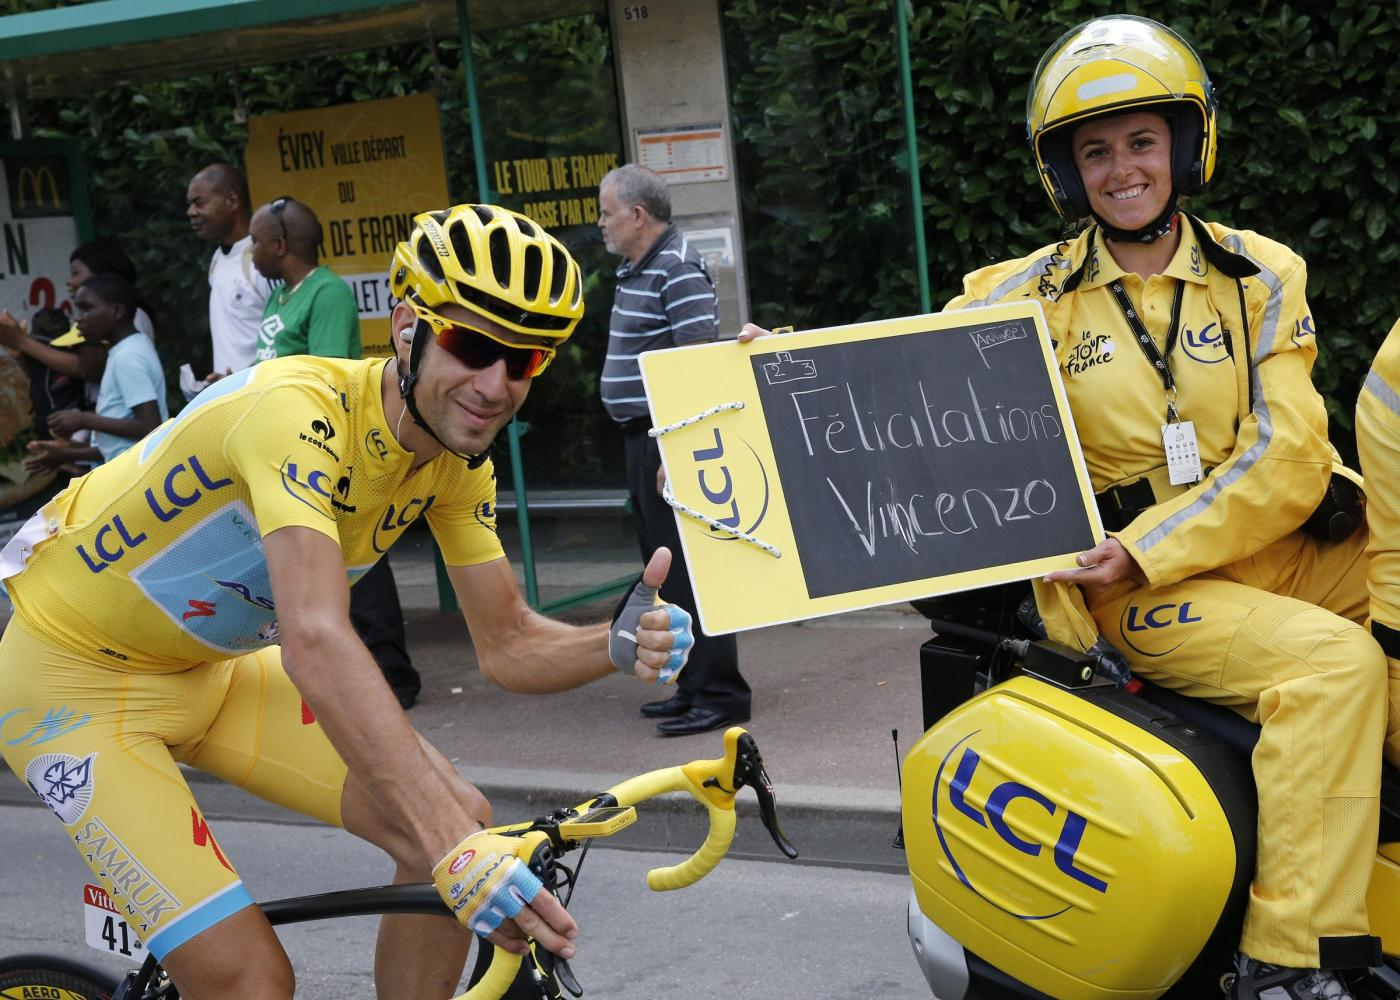 Vincenzo Nibali vince il Tour de France 2014, sedici anni dopo Pantani